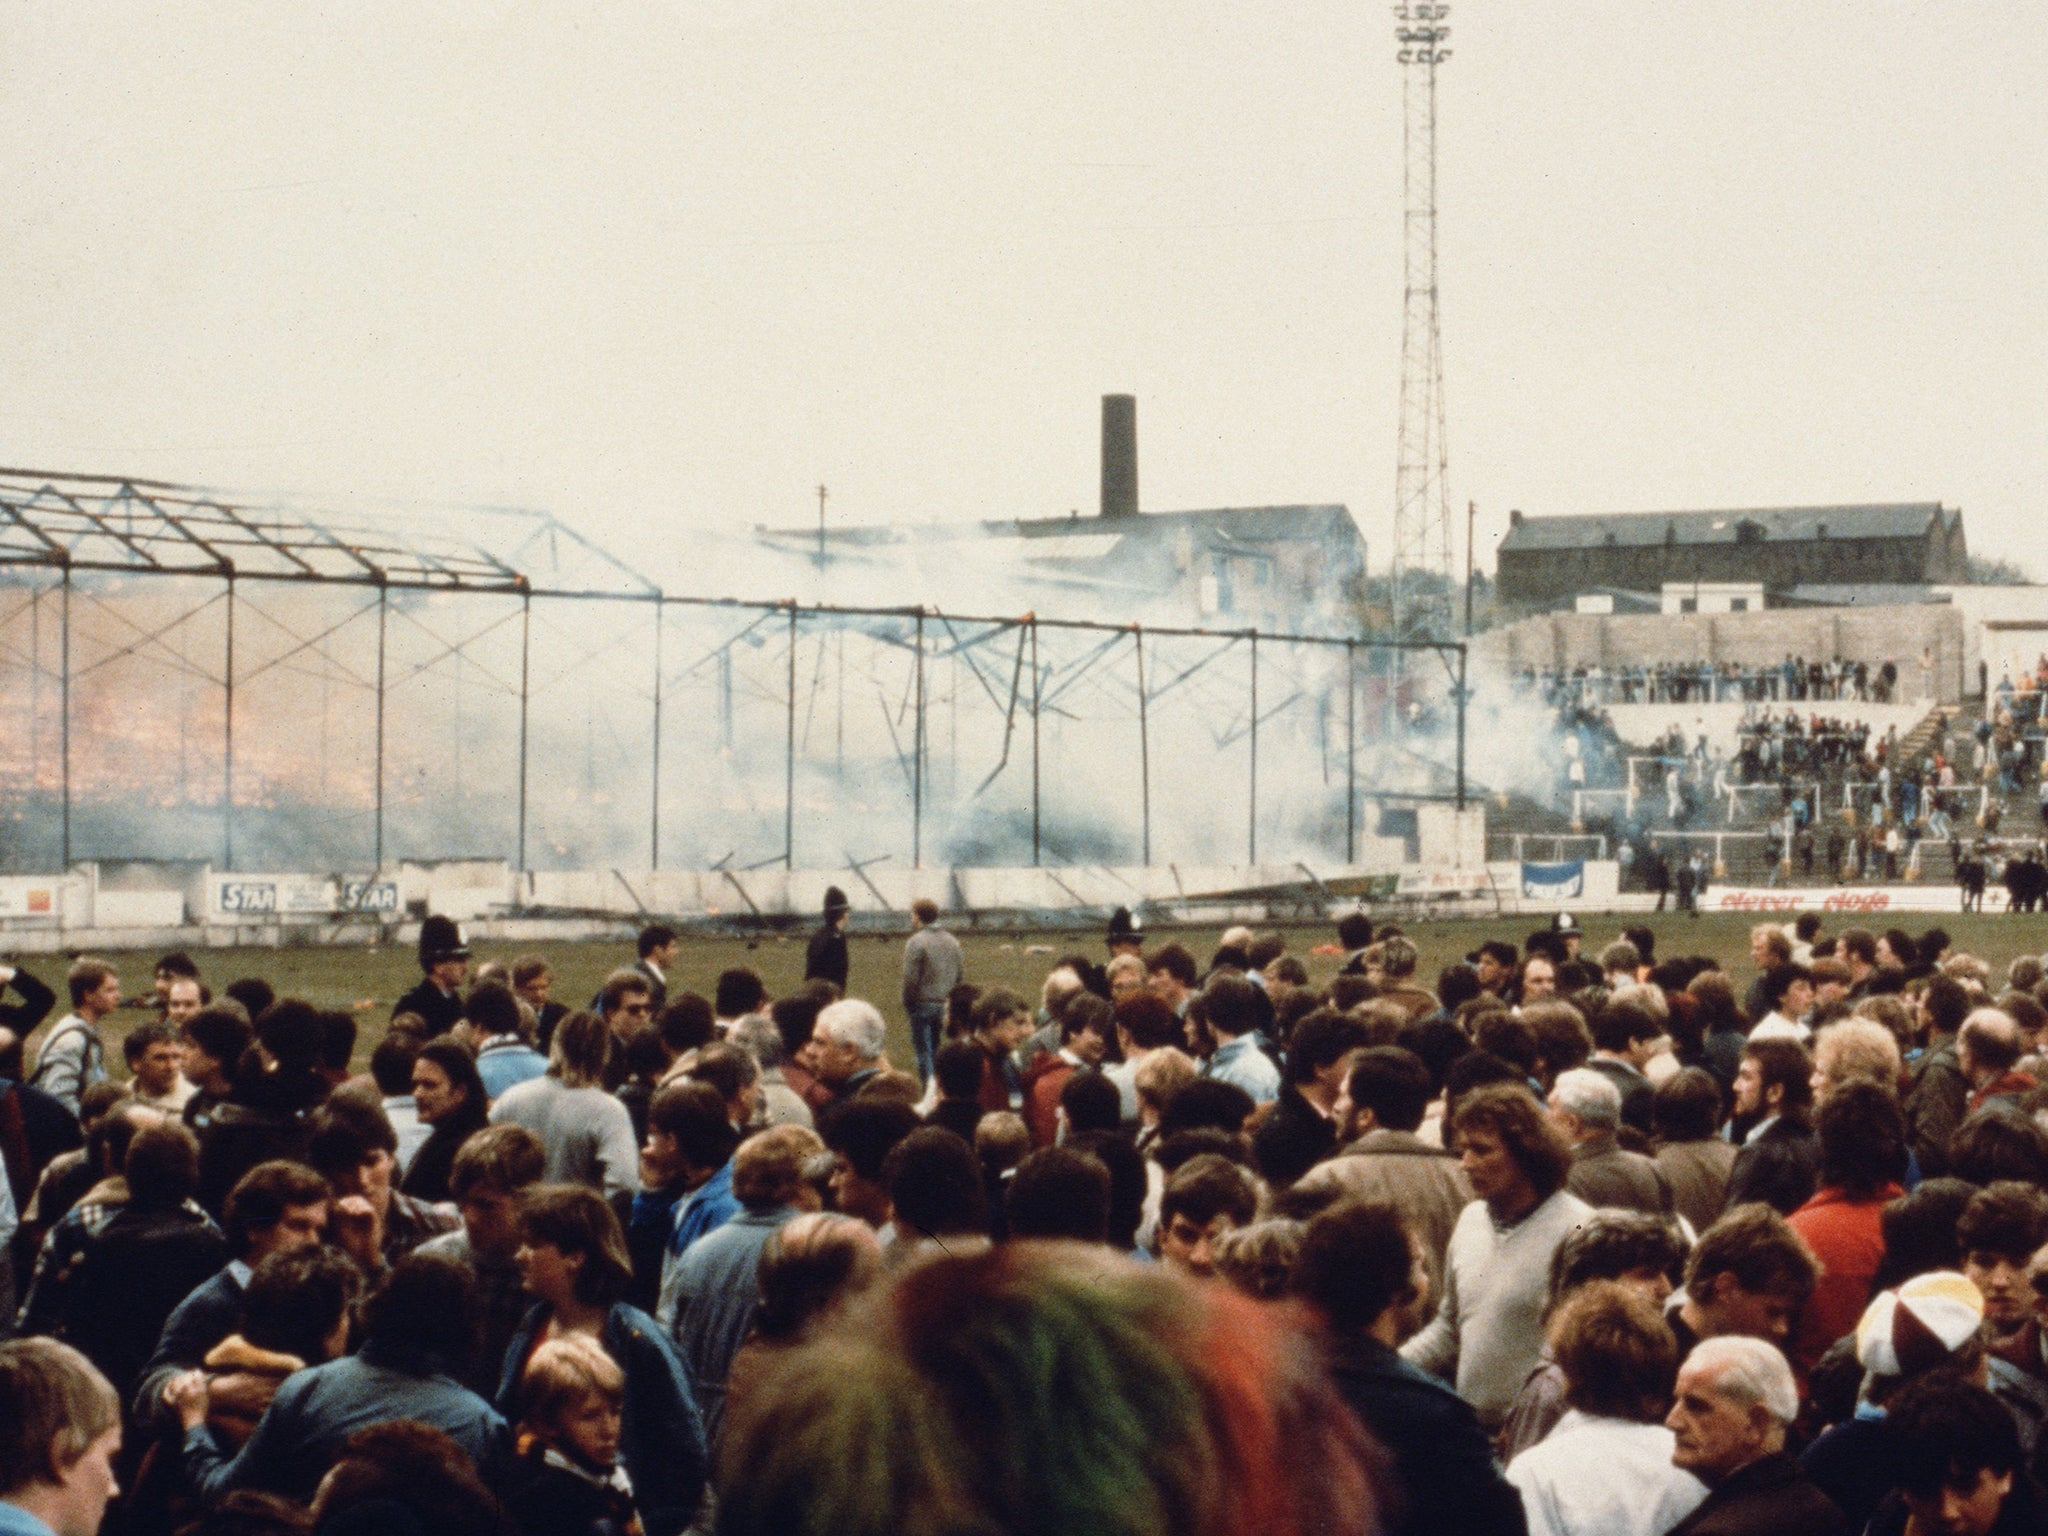 Bradford City stadium fire: 'Police were to blame' for ...